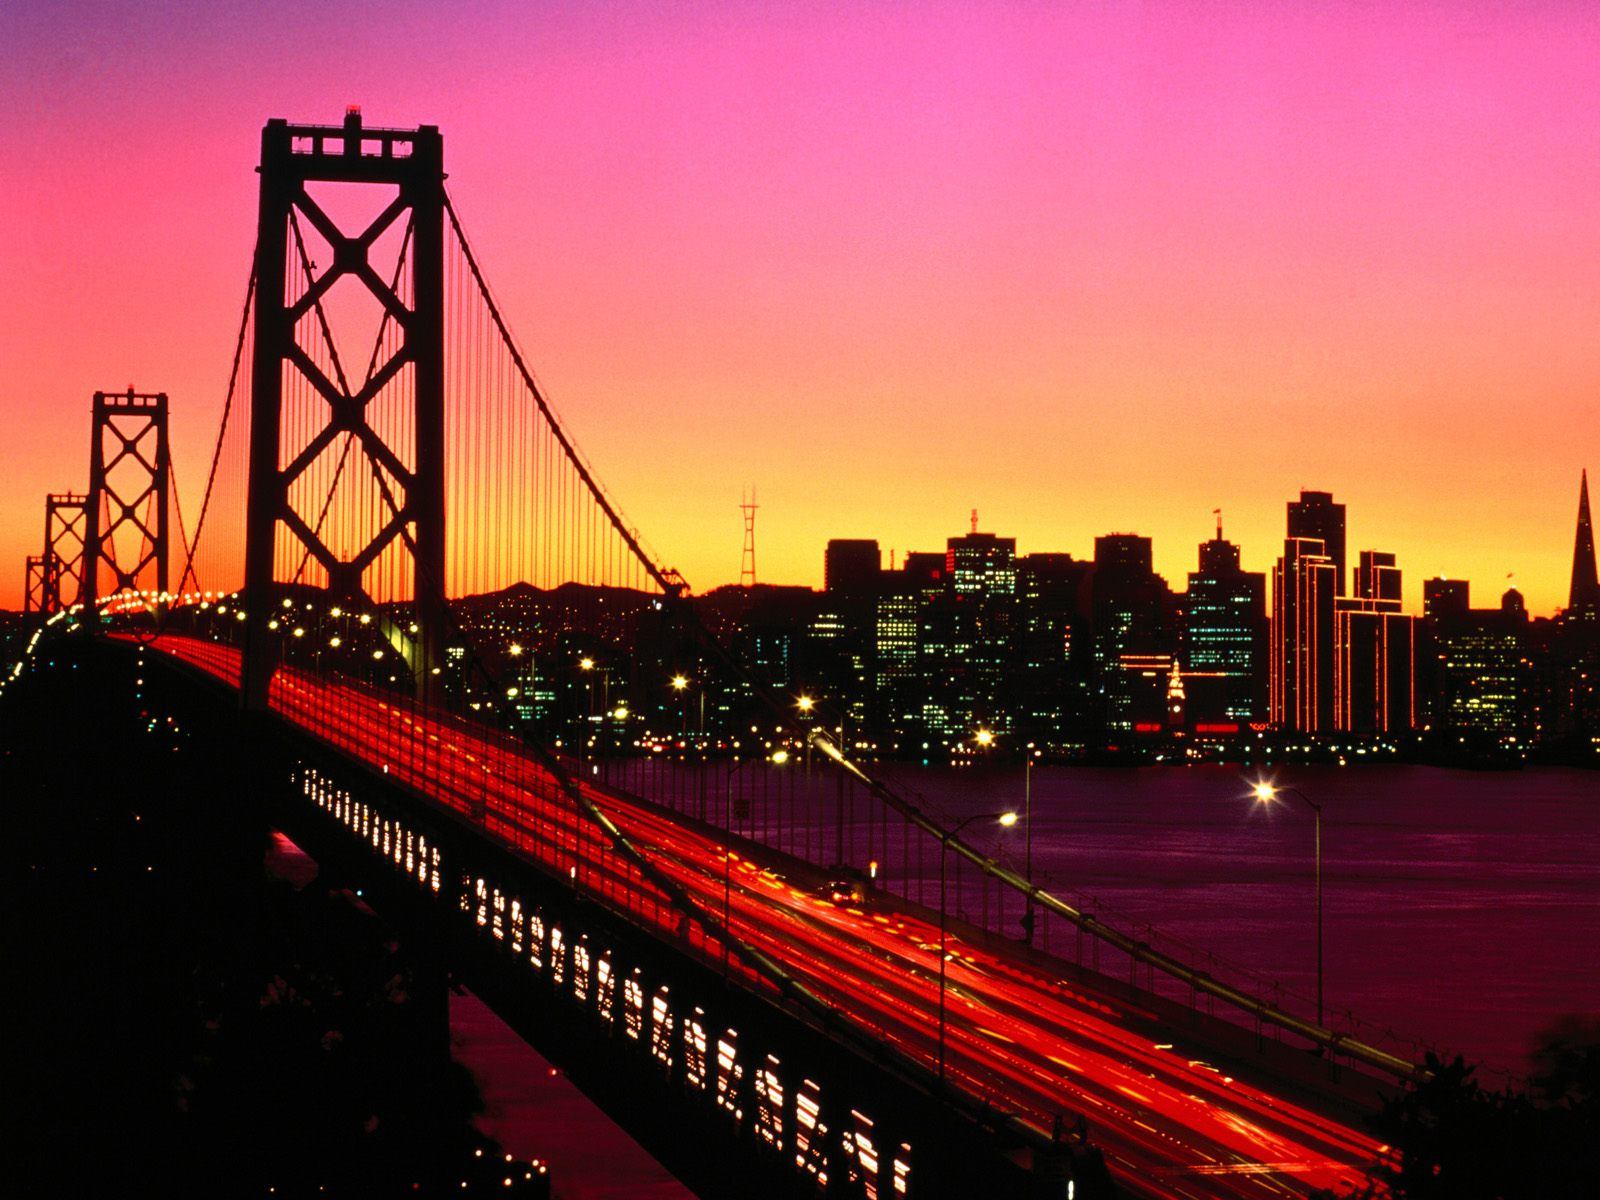 california wallpaper,cityscape,metropolitan area,bridge,city,landmark